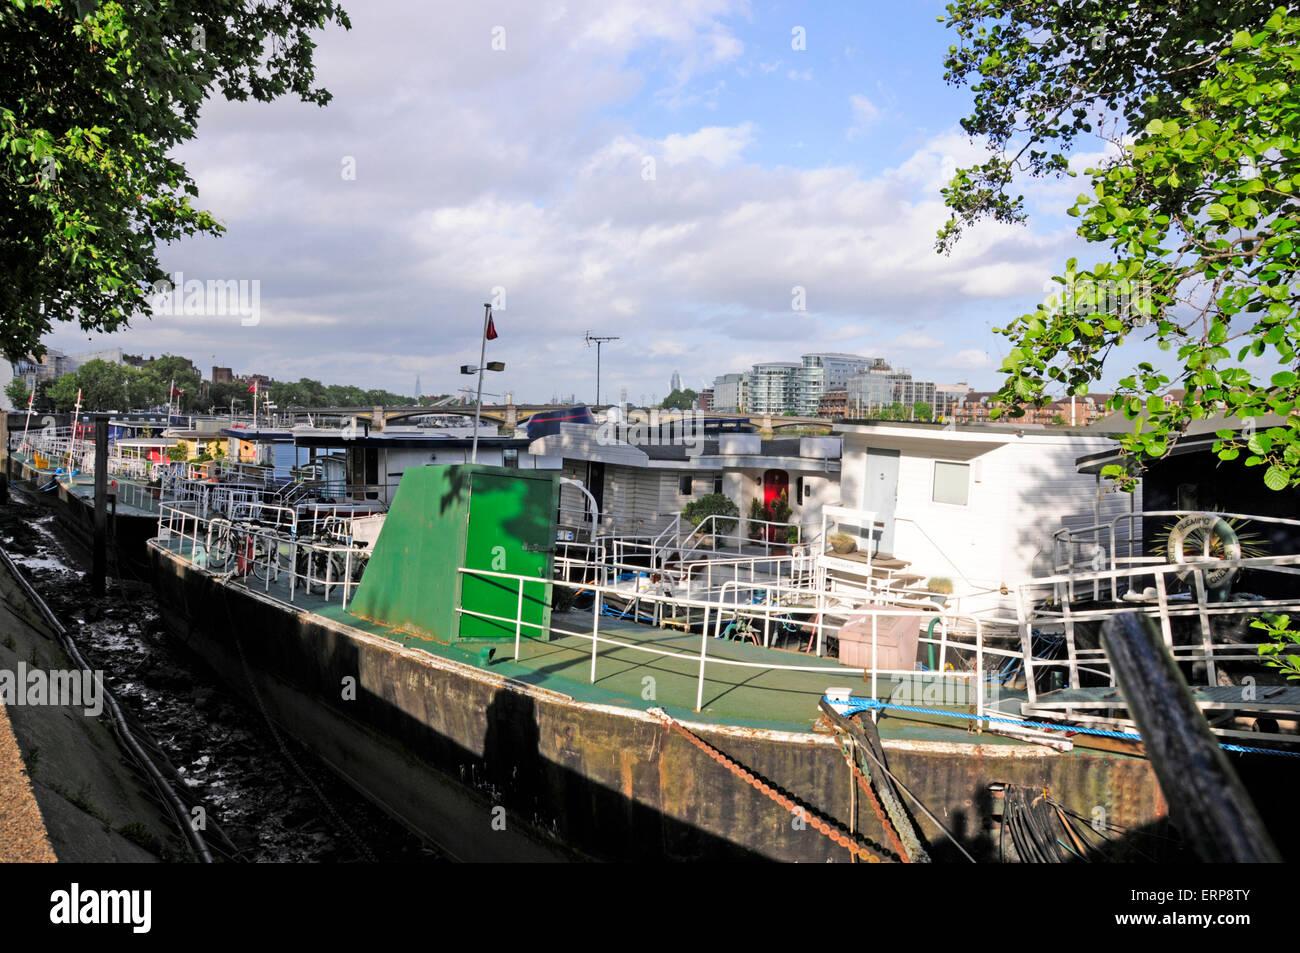 House boats, Chelsea Embankment, London, England Stock Photo